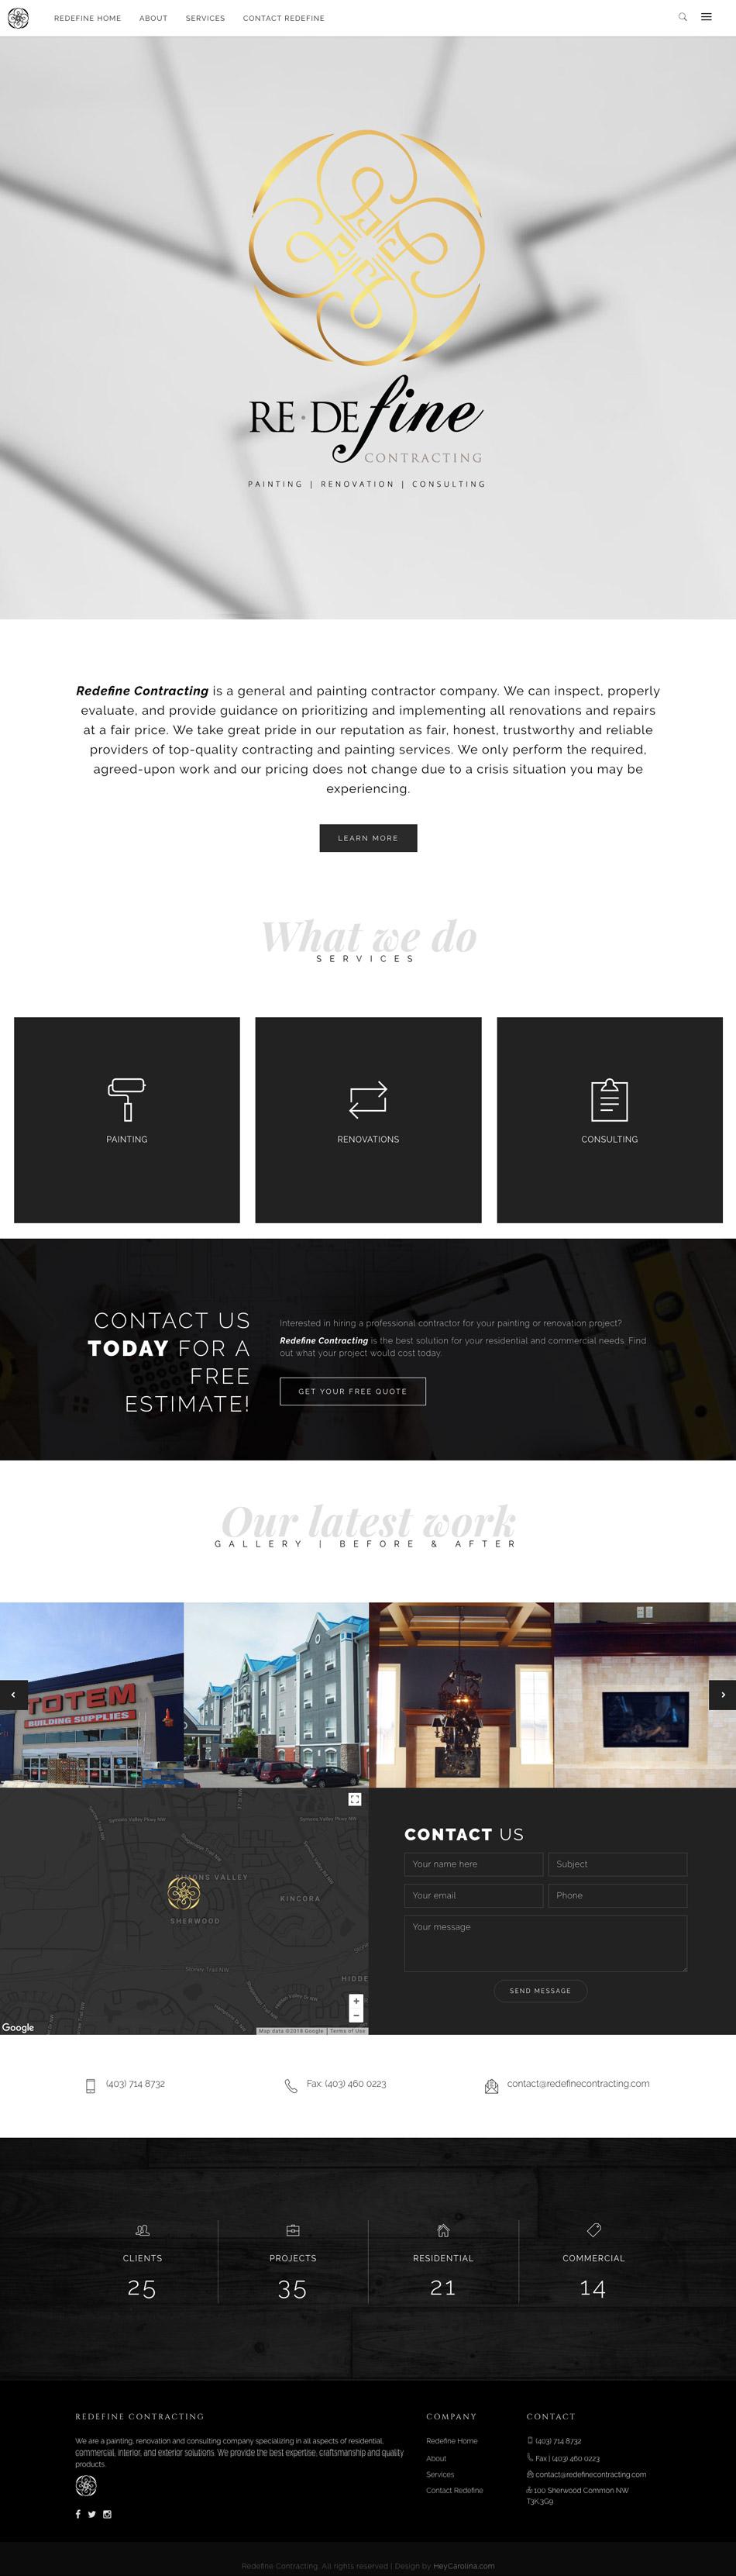 Redefine Contracting website design, graphic design, web development, wordpress